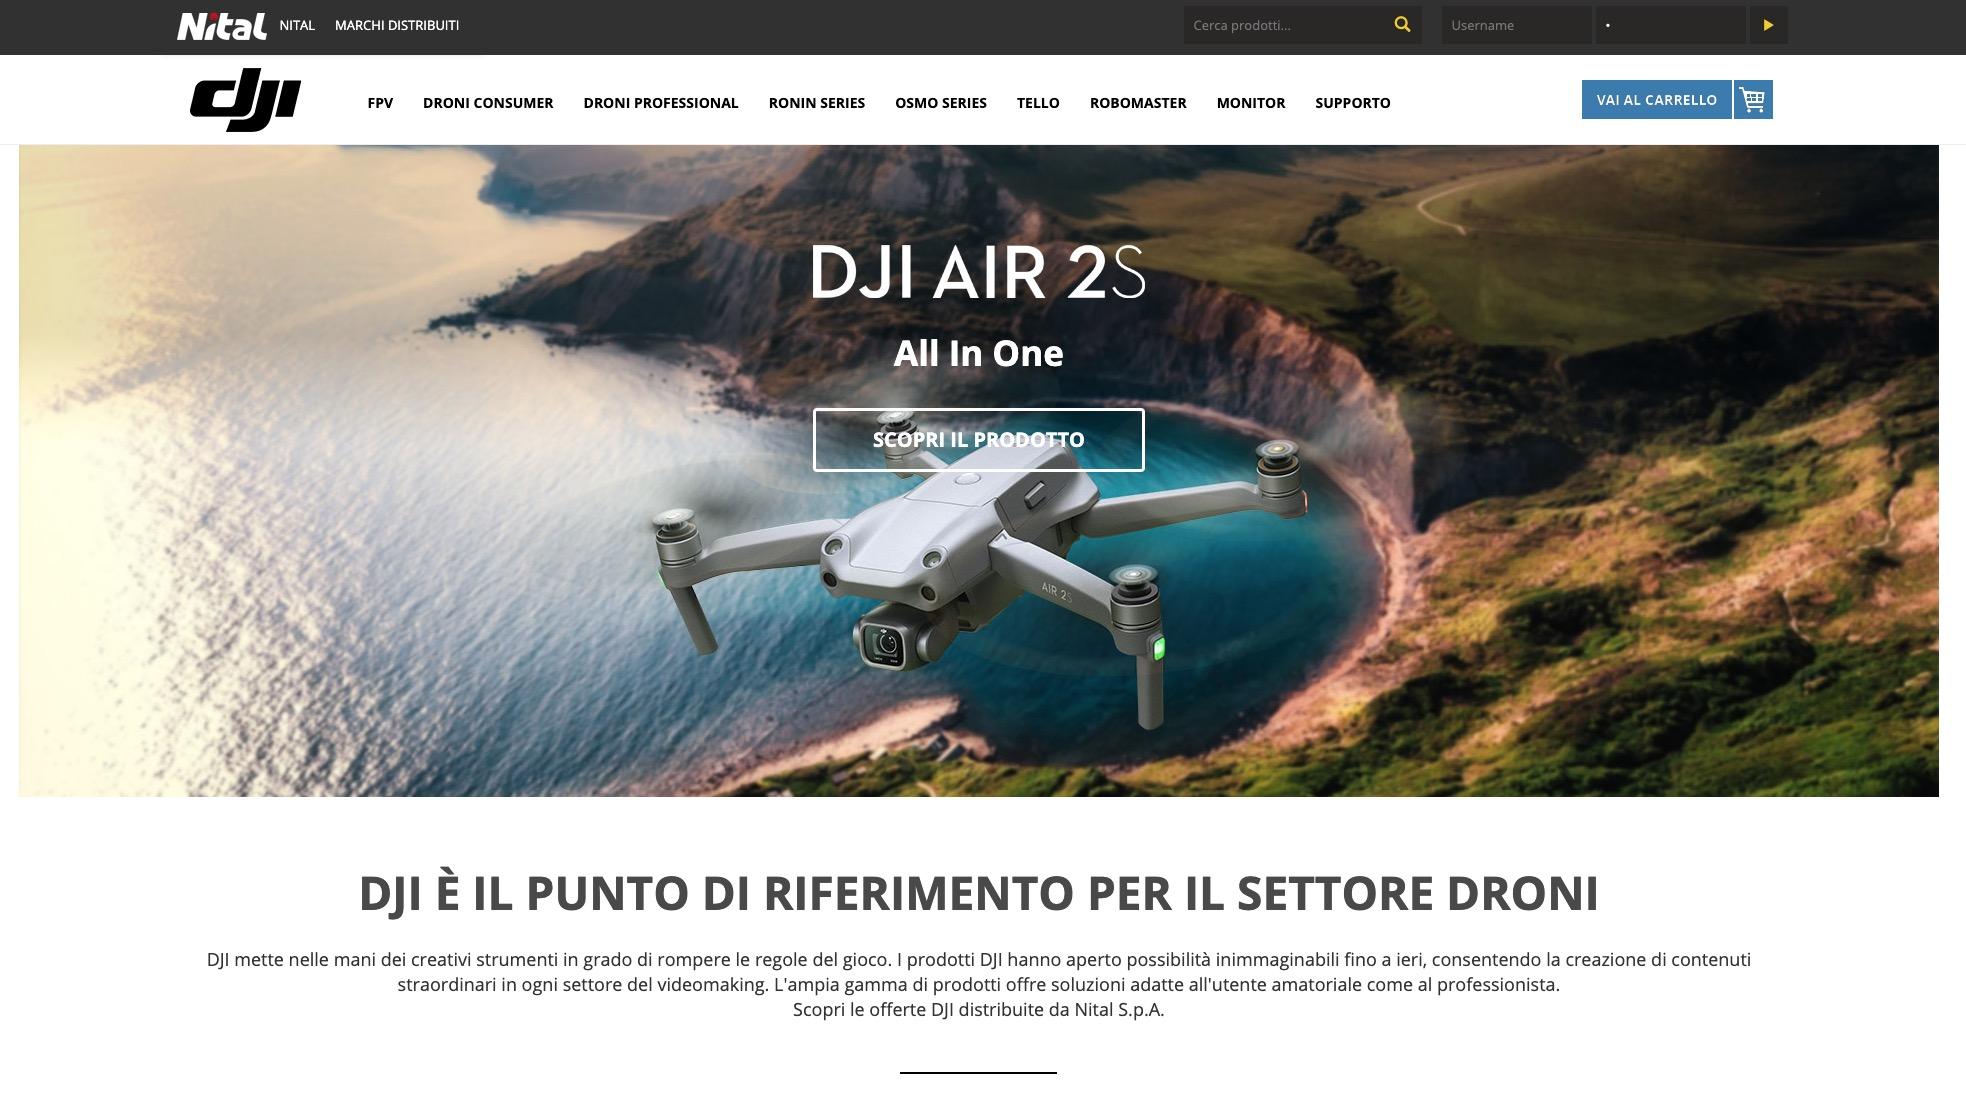 Nital apre lo store online italiano di DJI